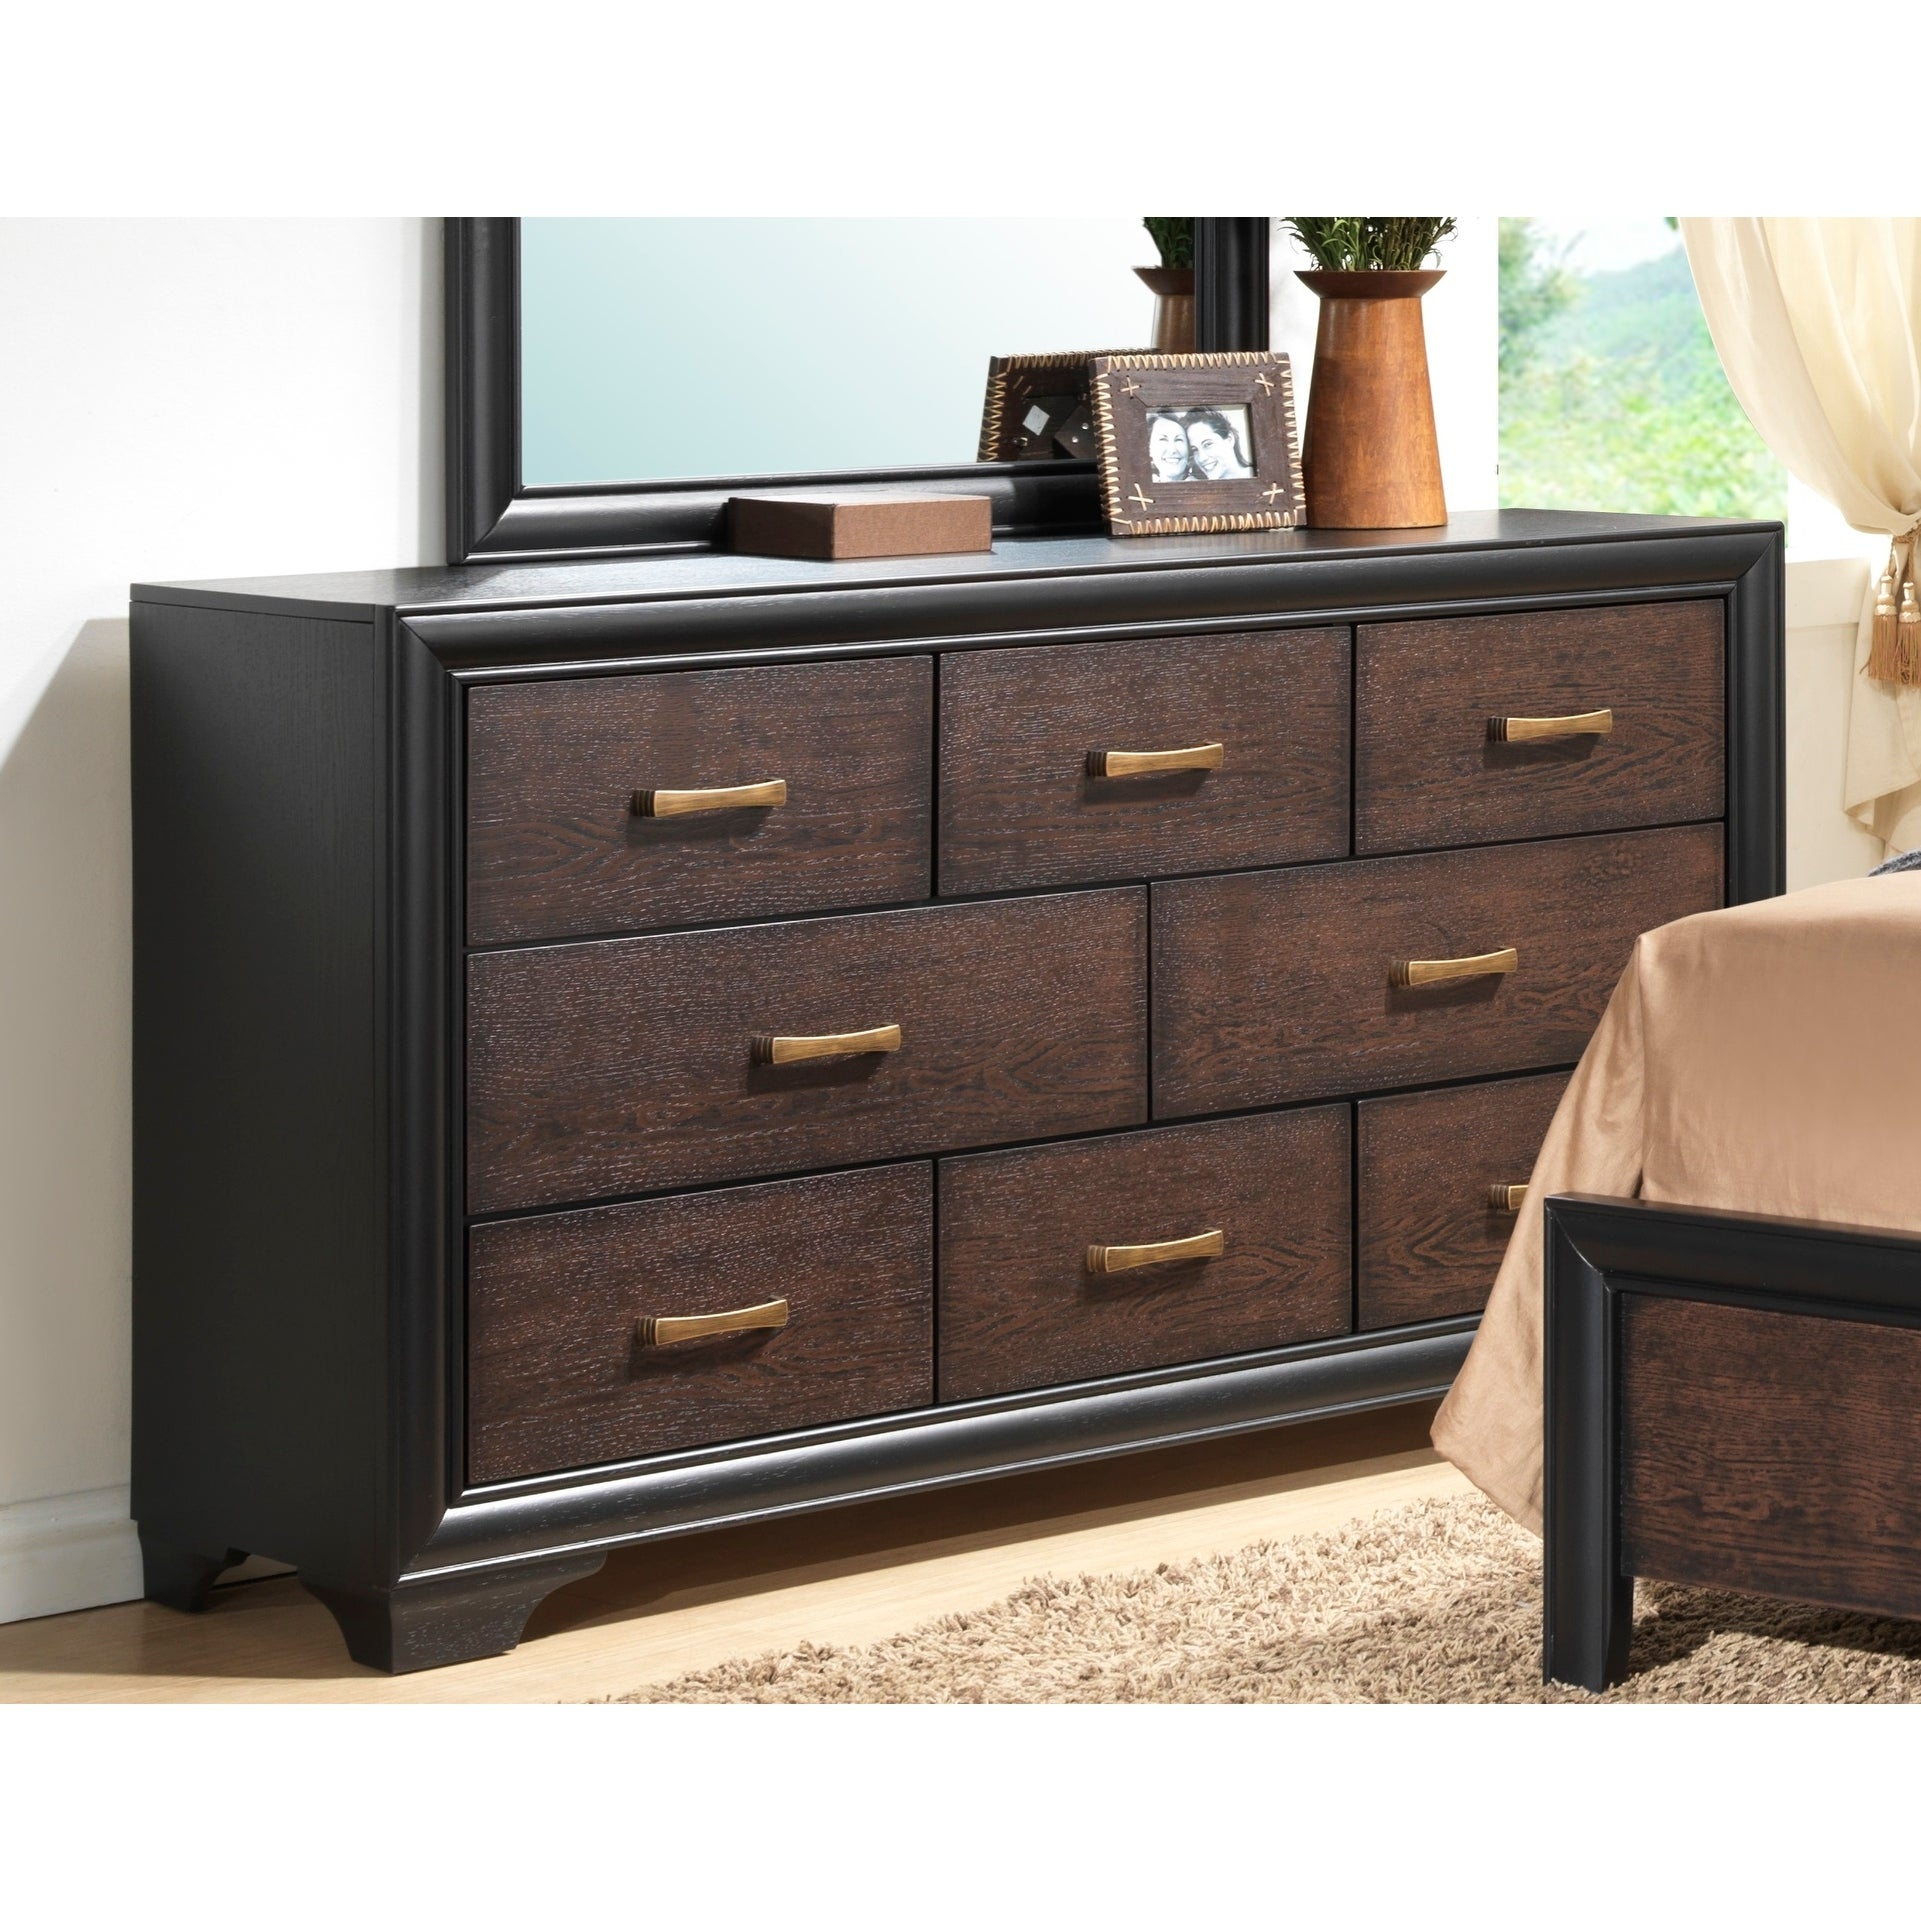 Drawer Honey Black And Brown Dresser